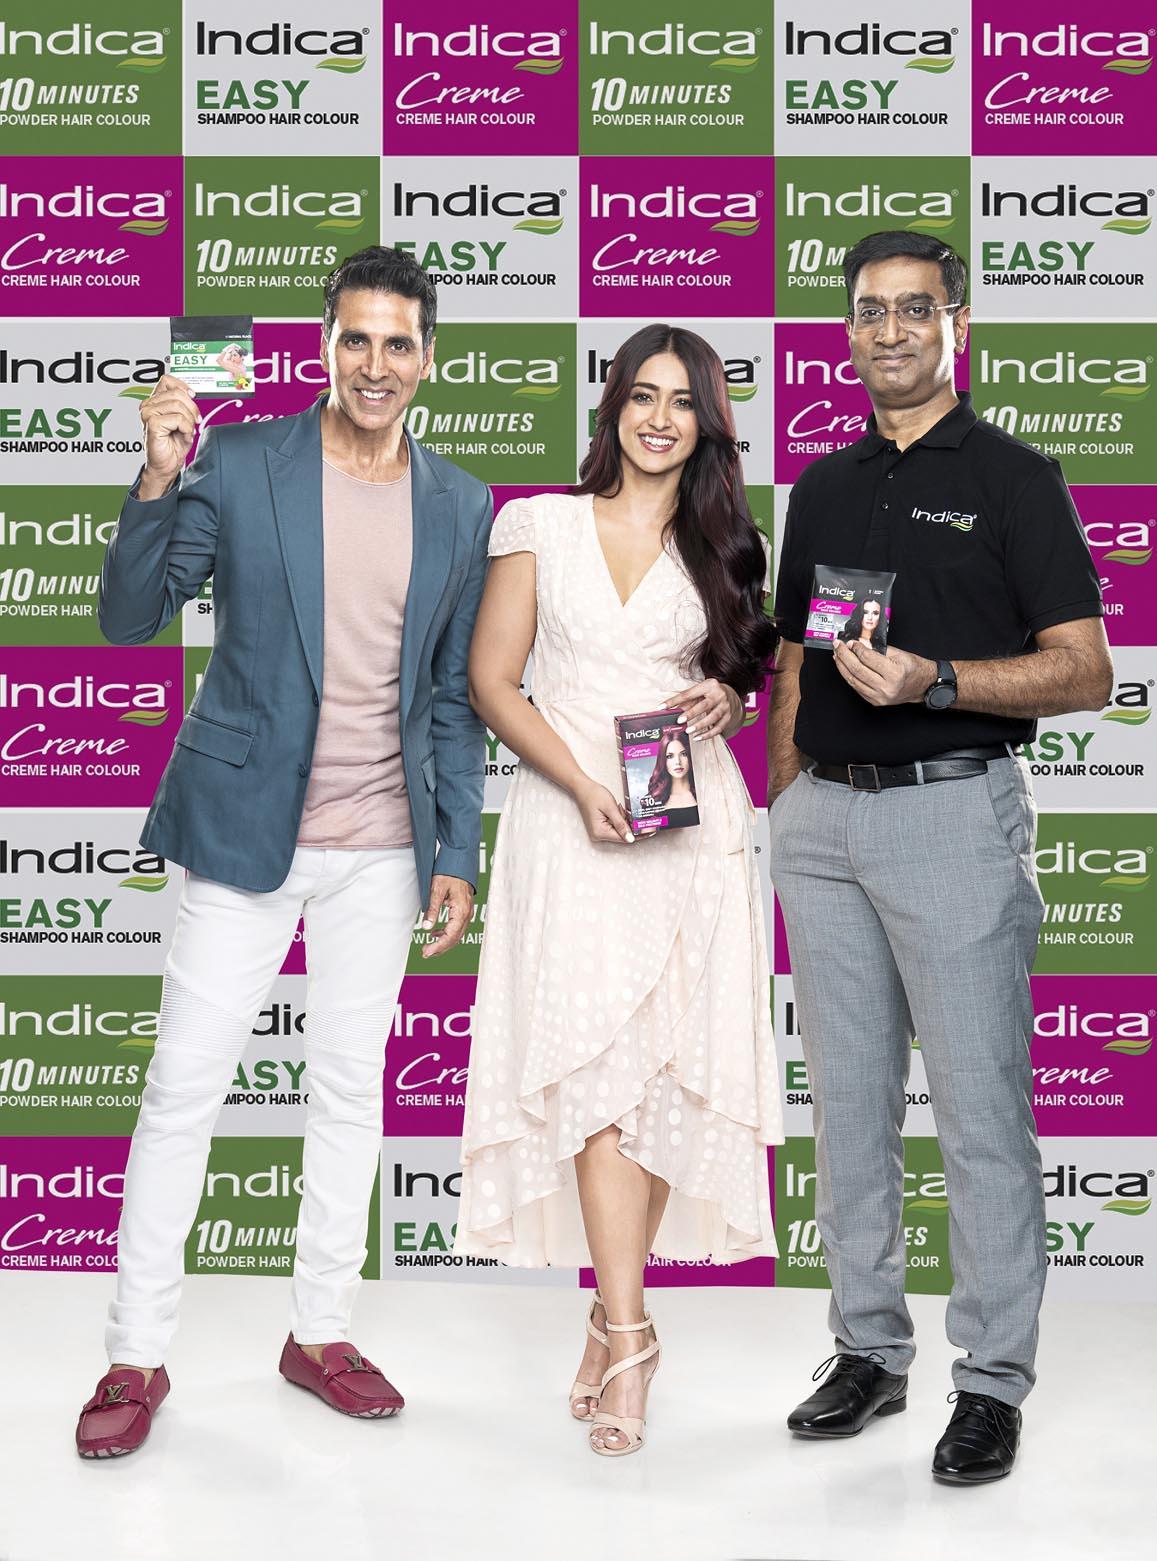 Akshay Kumar & Ileana D'Cruz as Brand Ambassadors